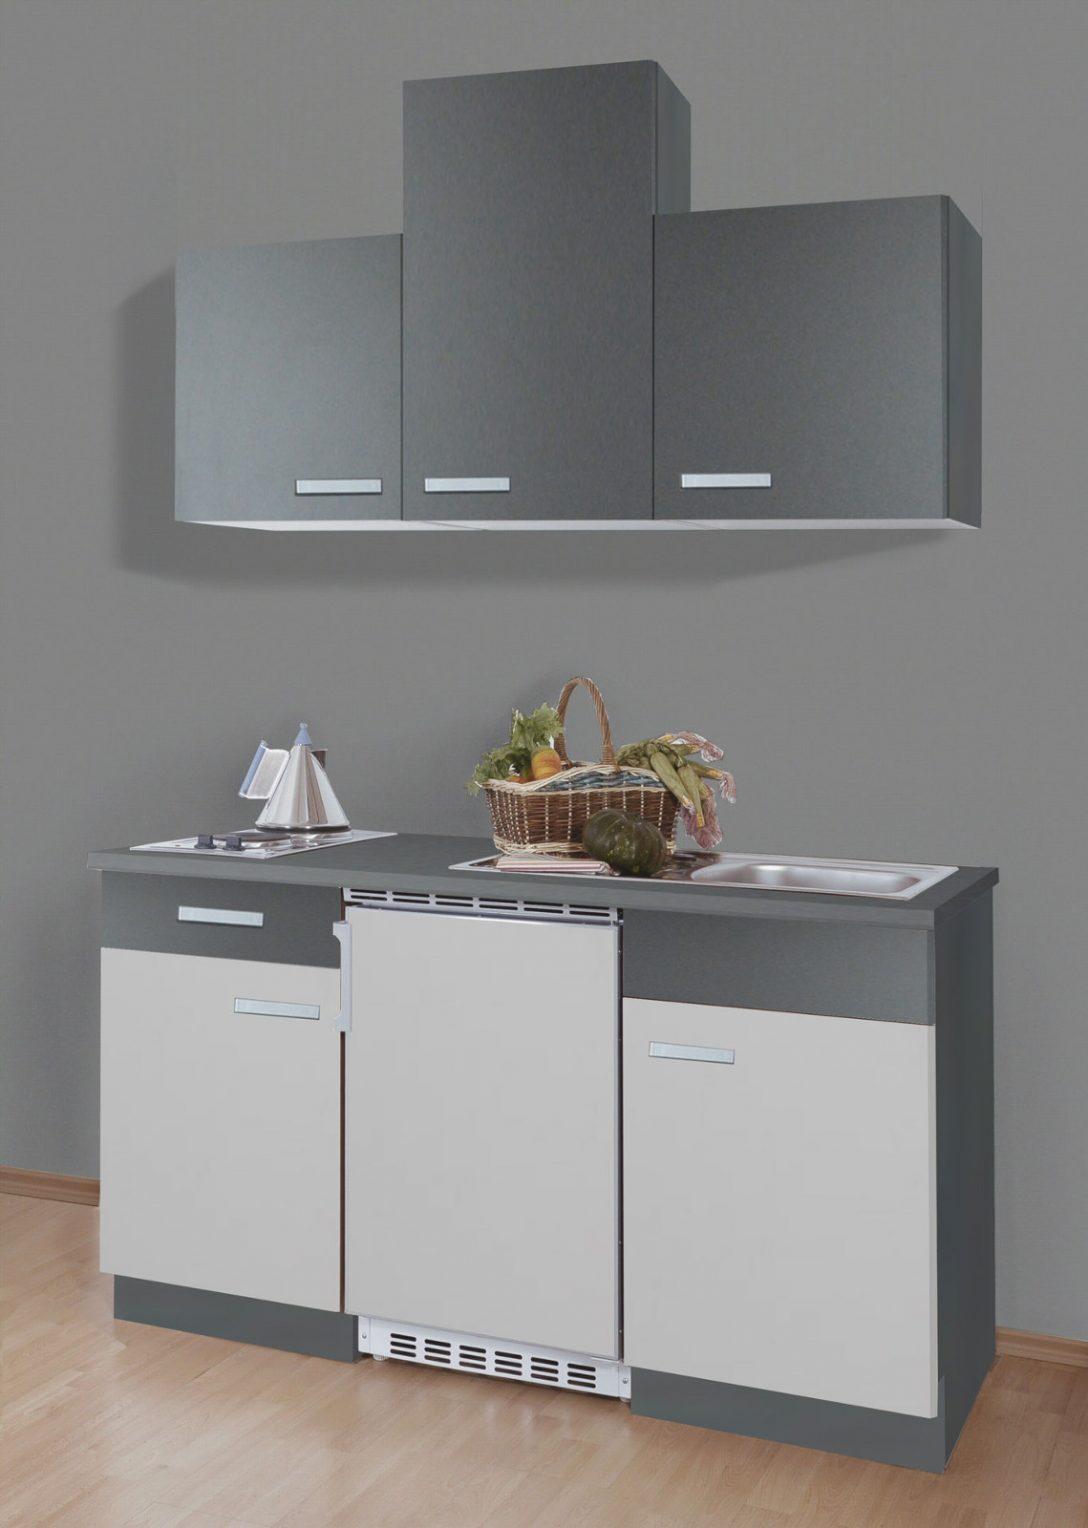 Large Size of Singleküche Ikea Värde Singleküche Zum Mitnehmen Singleküche Trends Singleküche Gebraucht Küche Singleküche